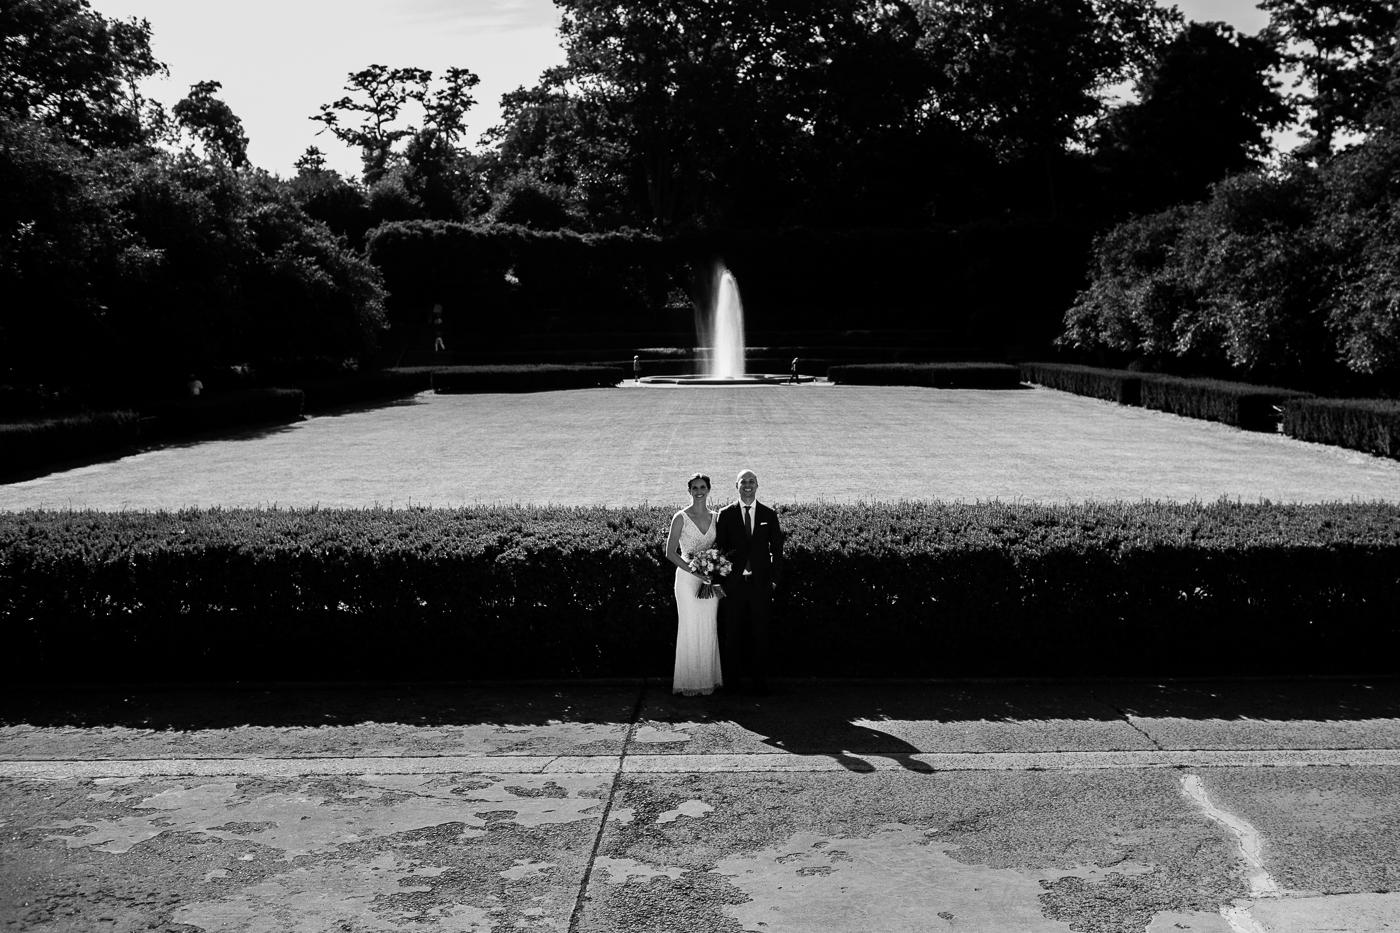 NYC-Central-Park-Conservatory-Garden-Intimate-Elopement-Documentary-Wedding-Photographer-44.jpg